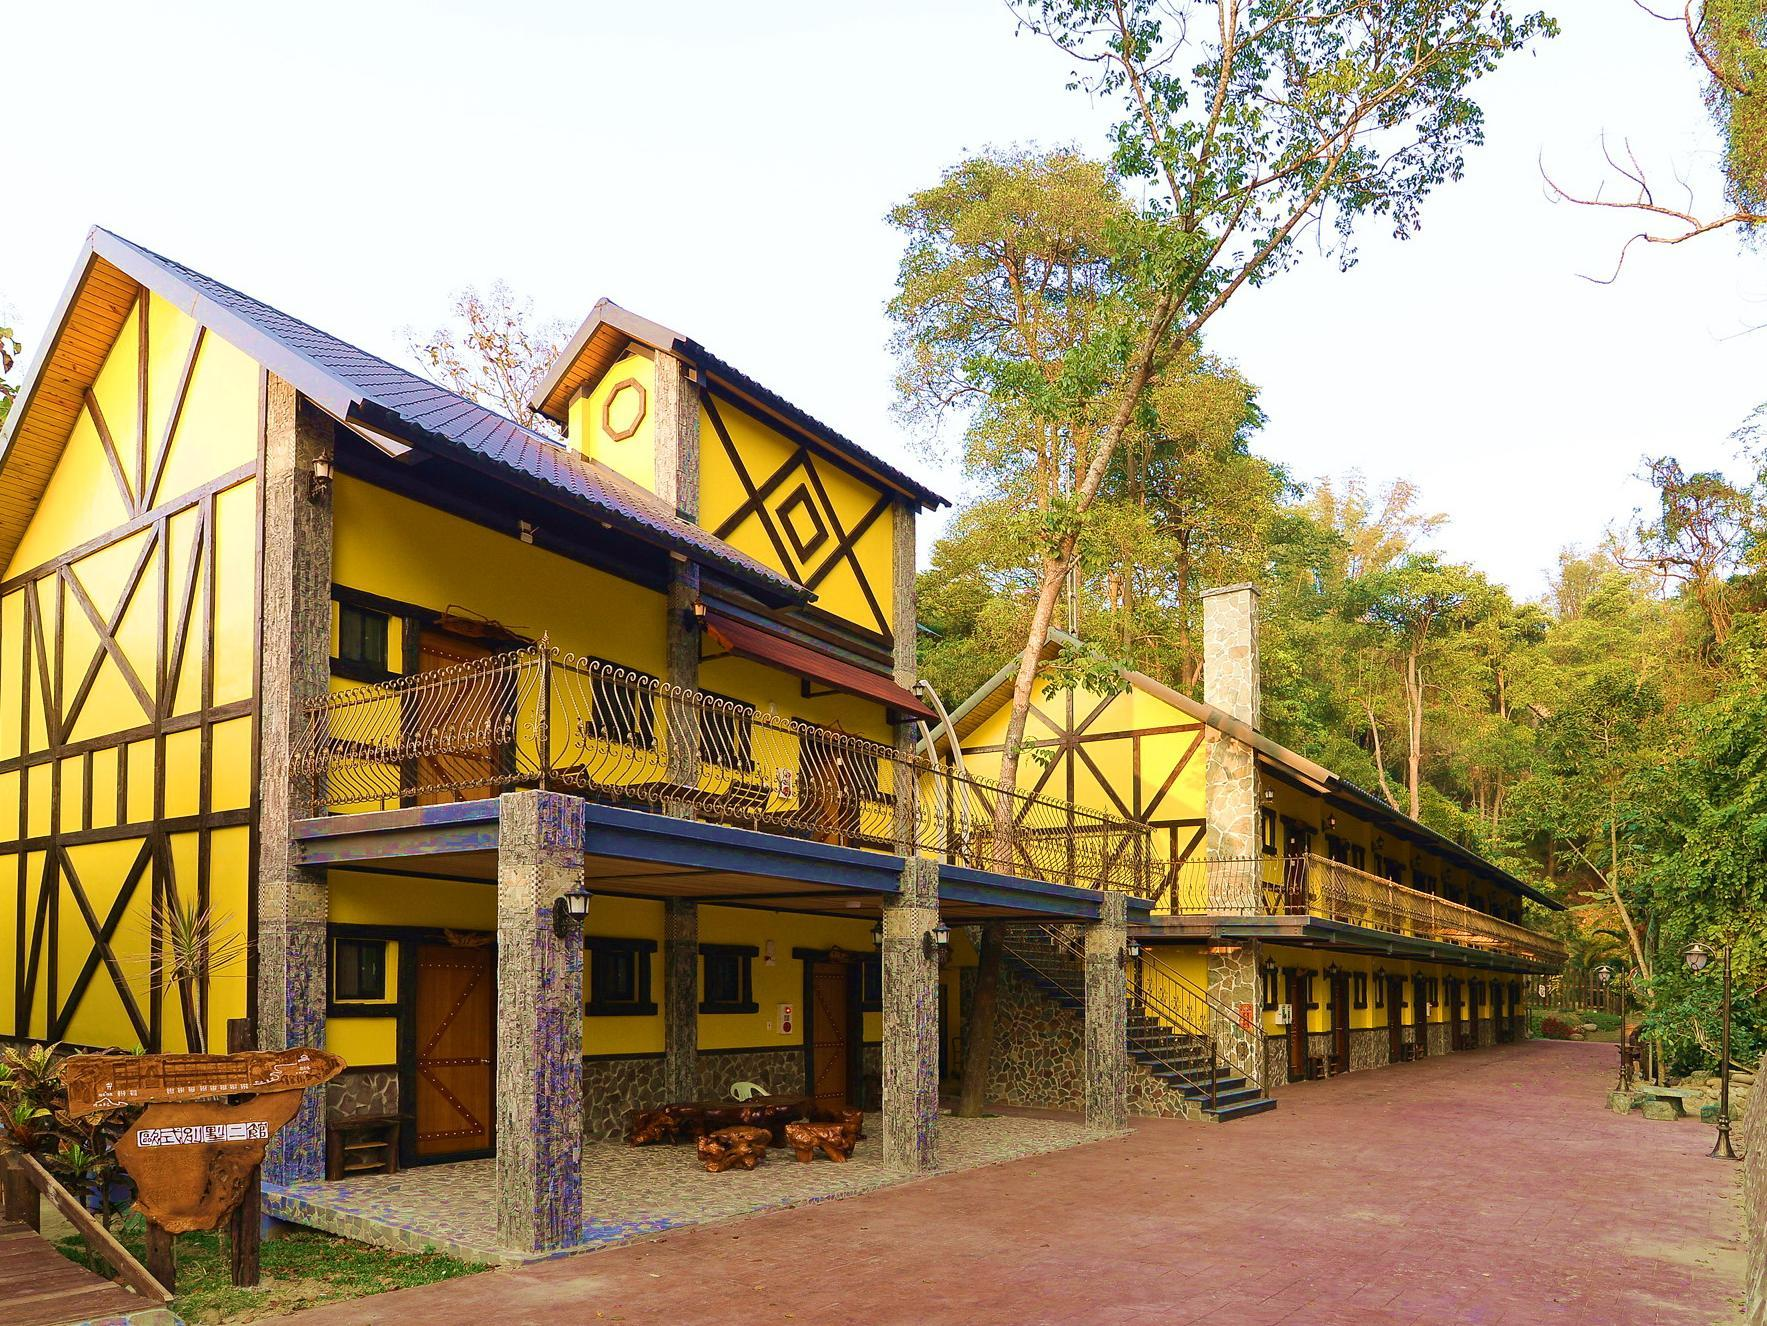 Dakeng Leisure Farm